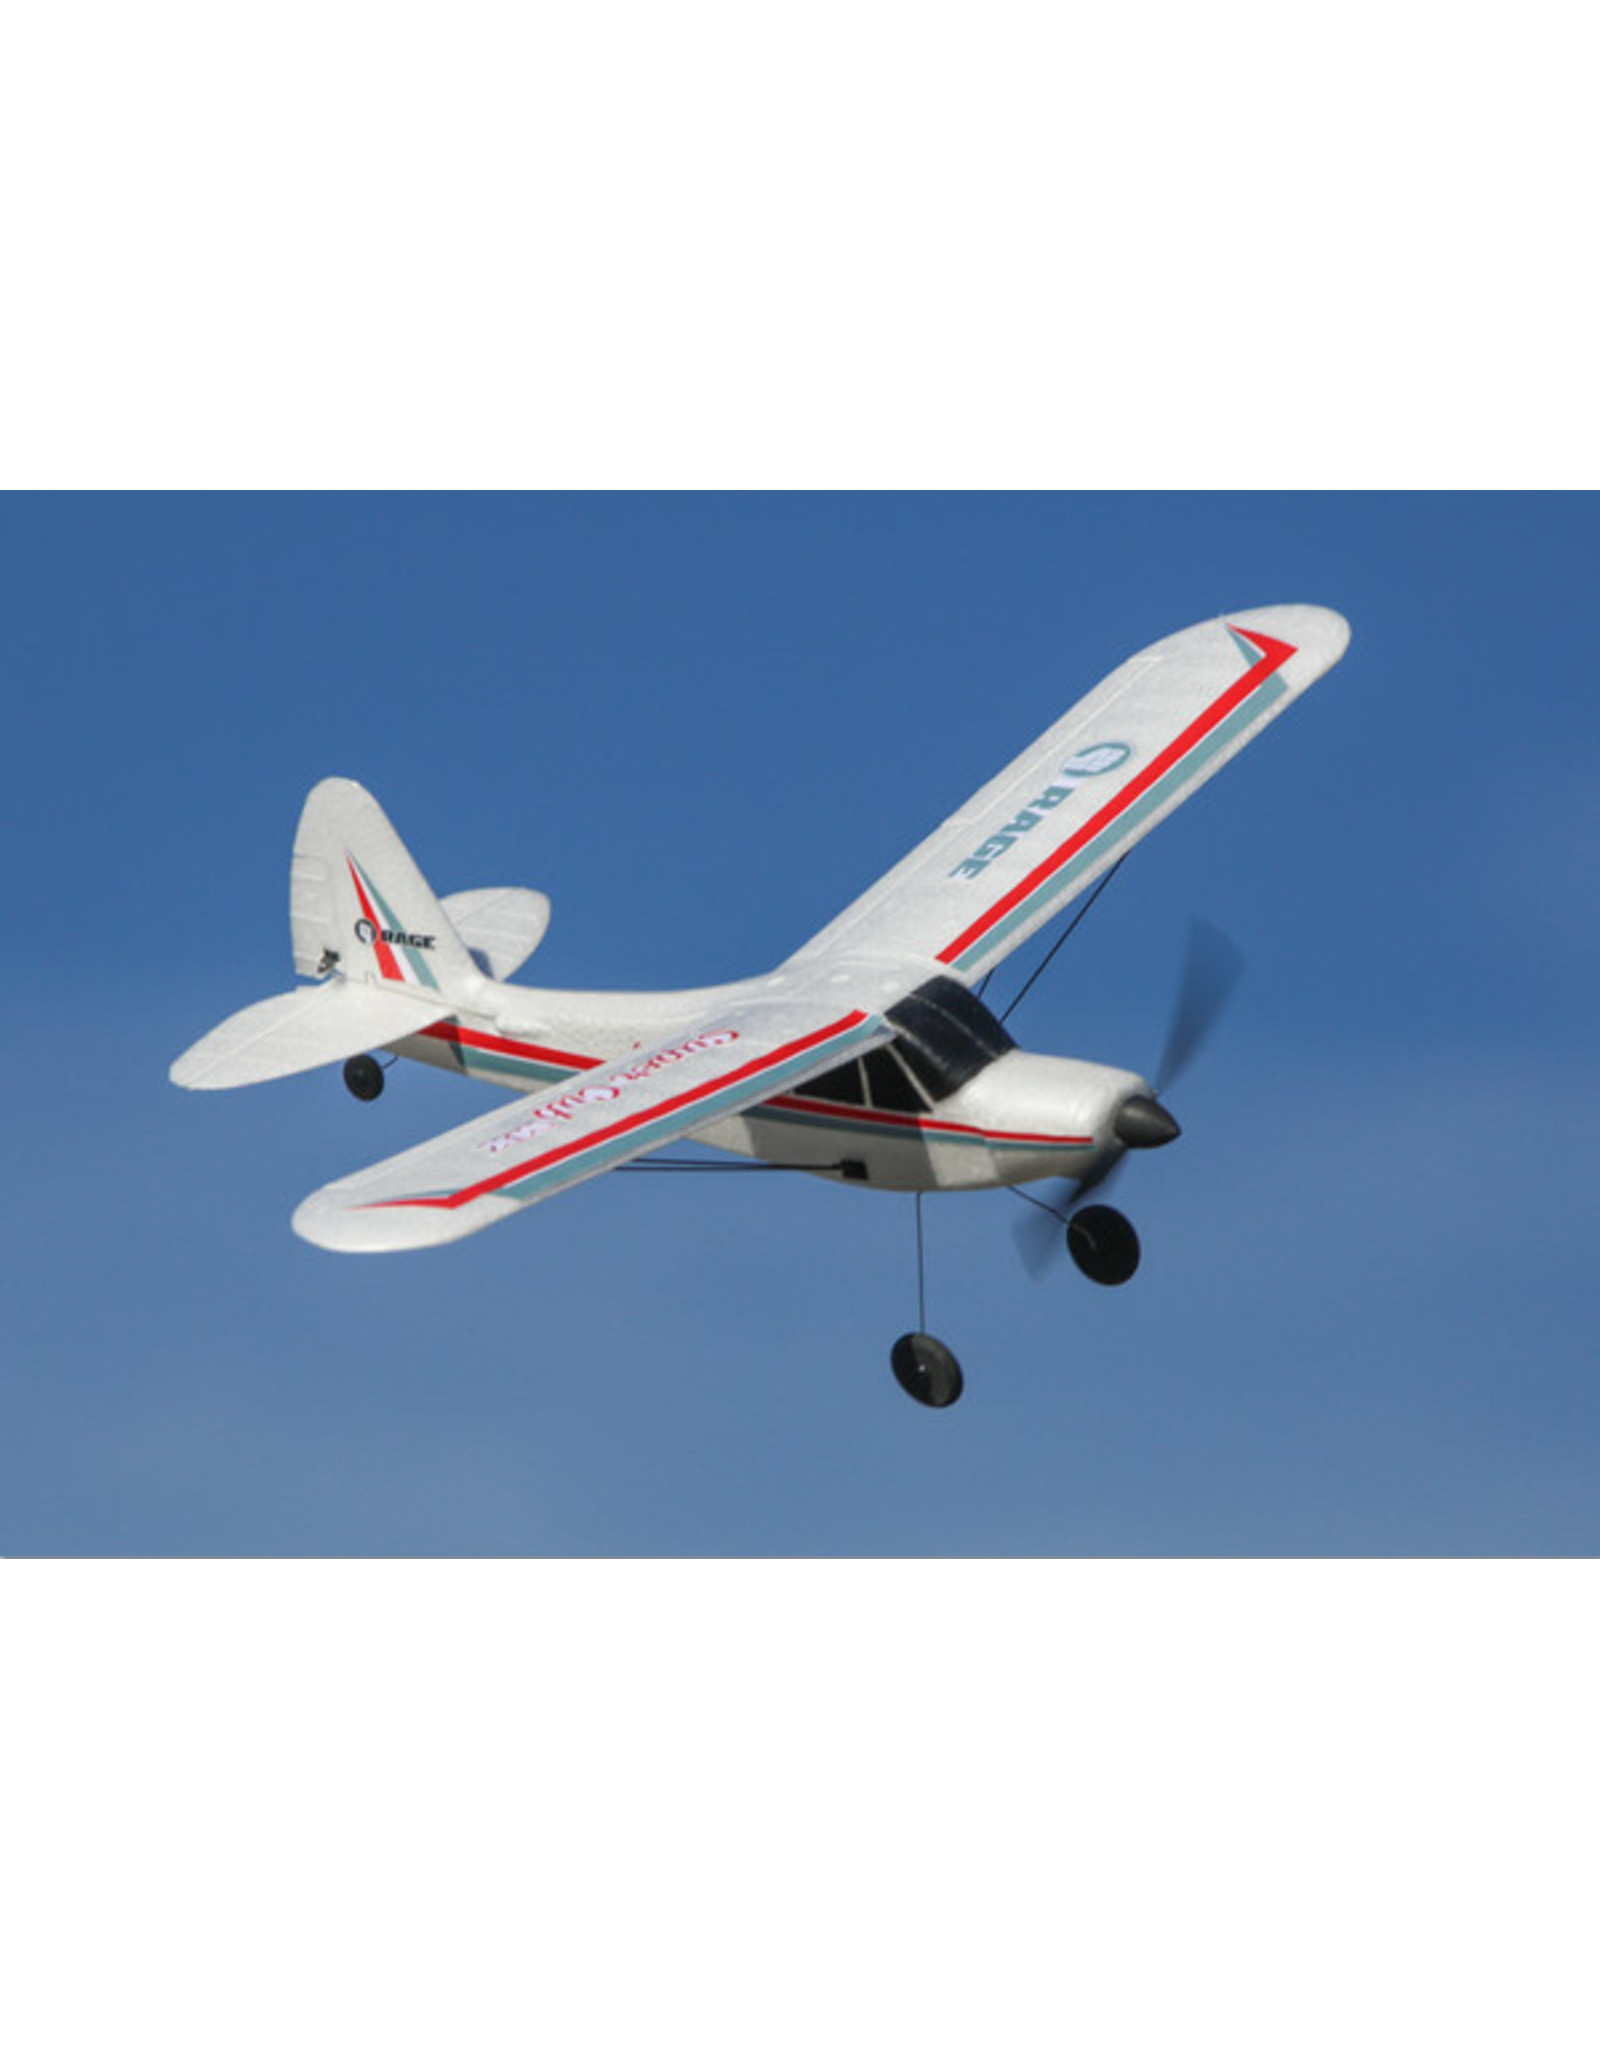 Rage RC Super Cub MX Micro EP 3-Channel RTF Airplane